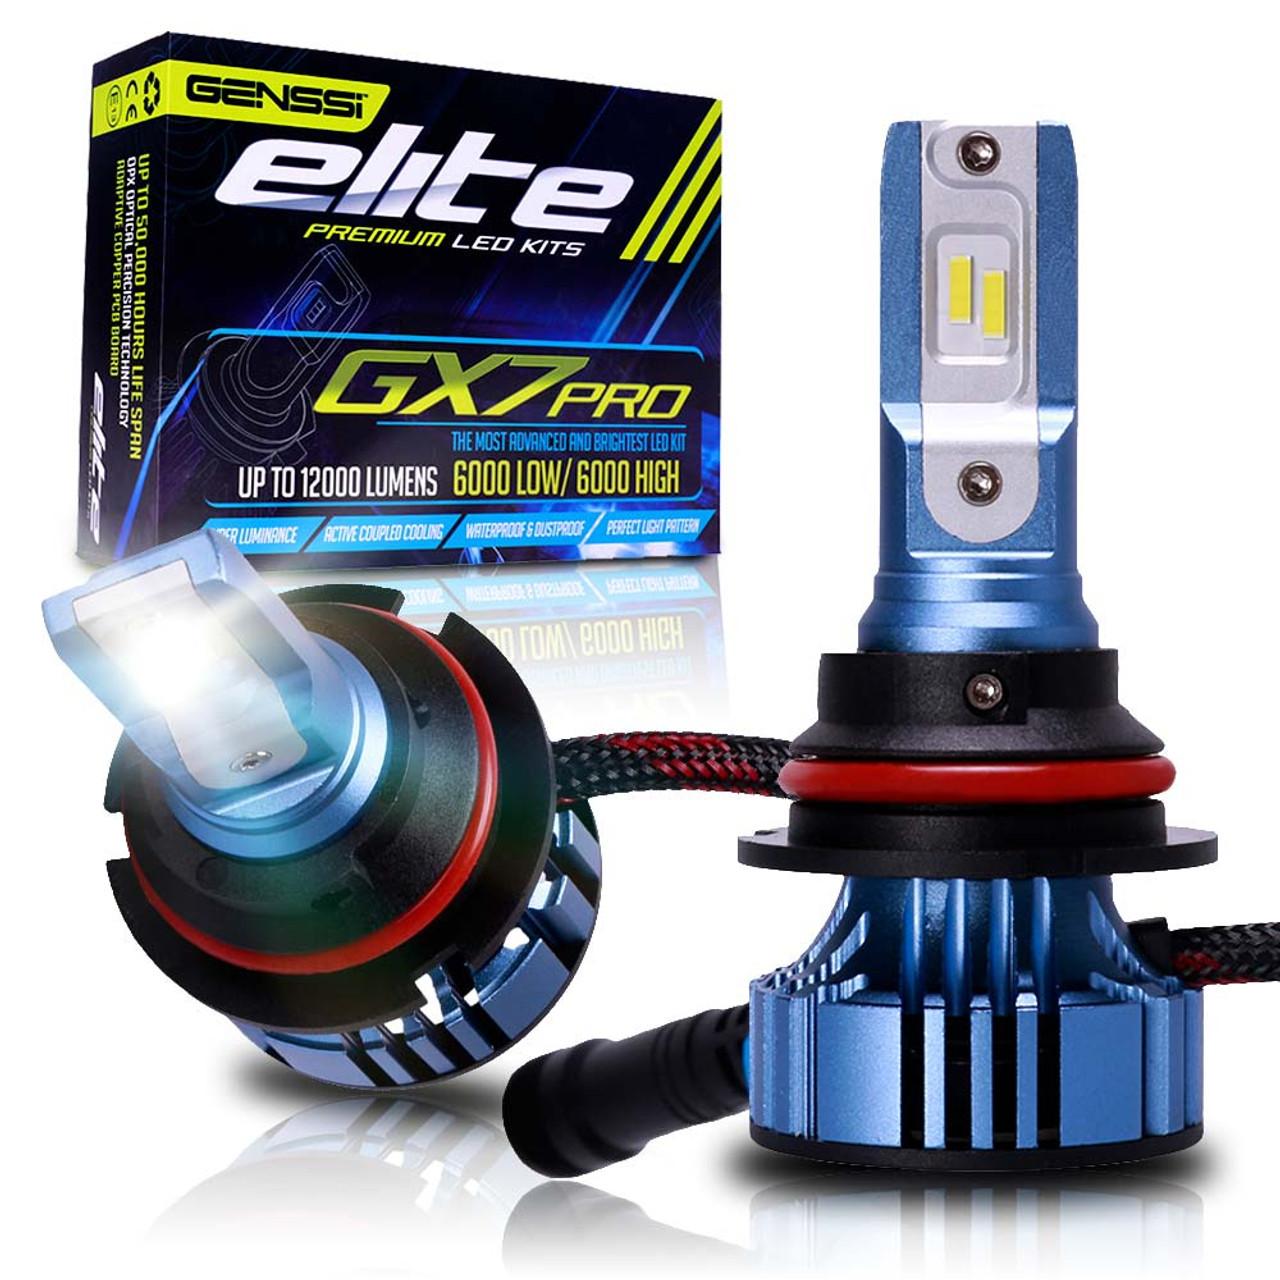 Gx7 Pro Led Headlight Conversion Kit 6500k Bulbs Genssi Light Bar Wiring Diagram